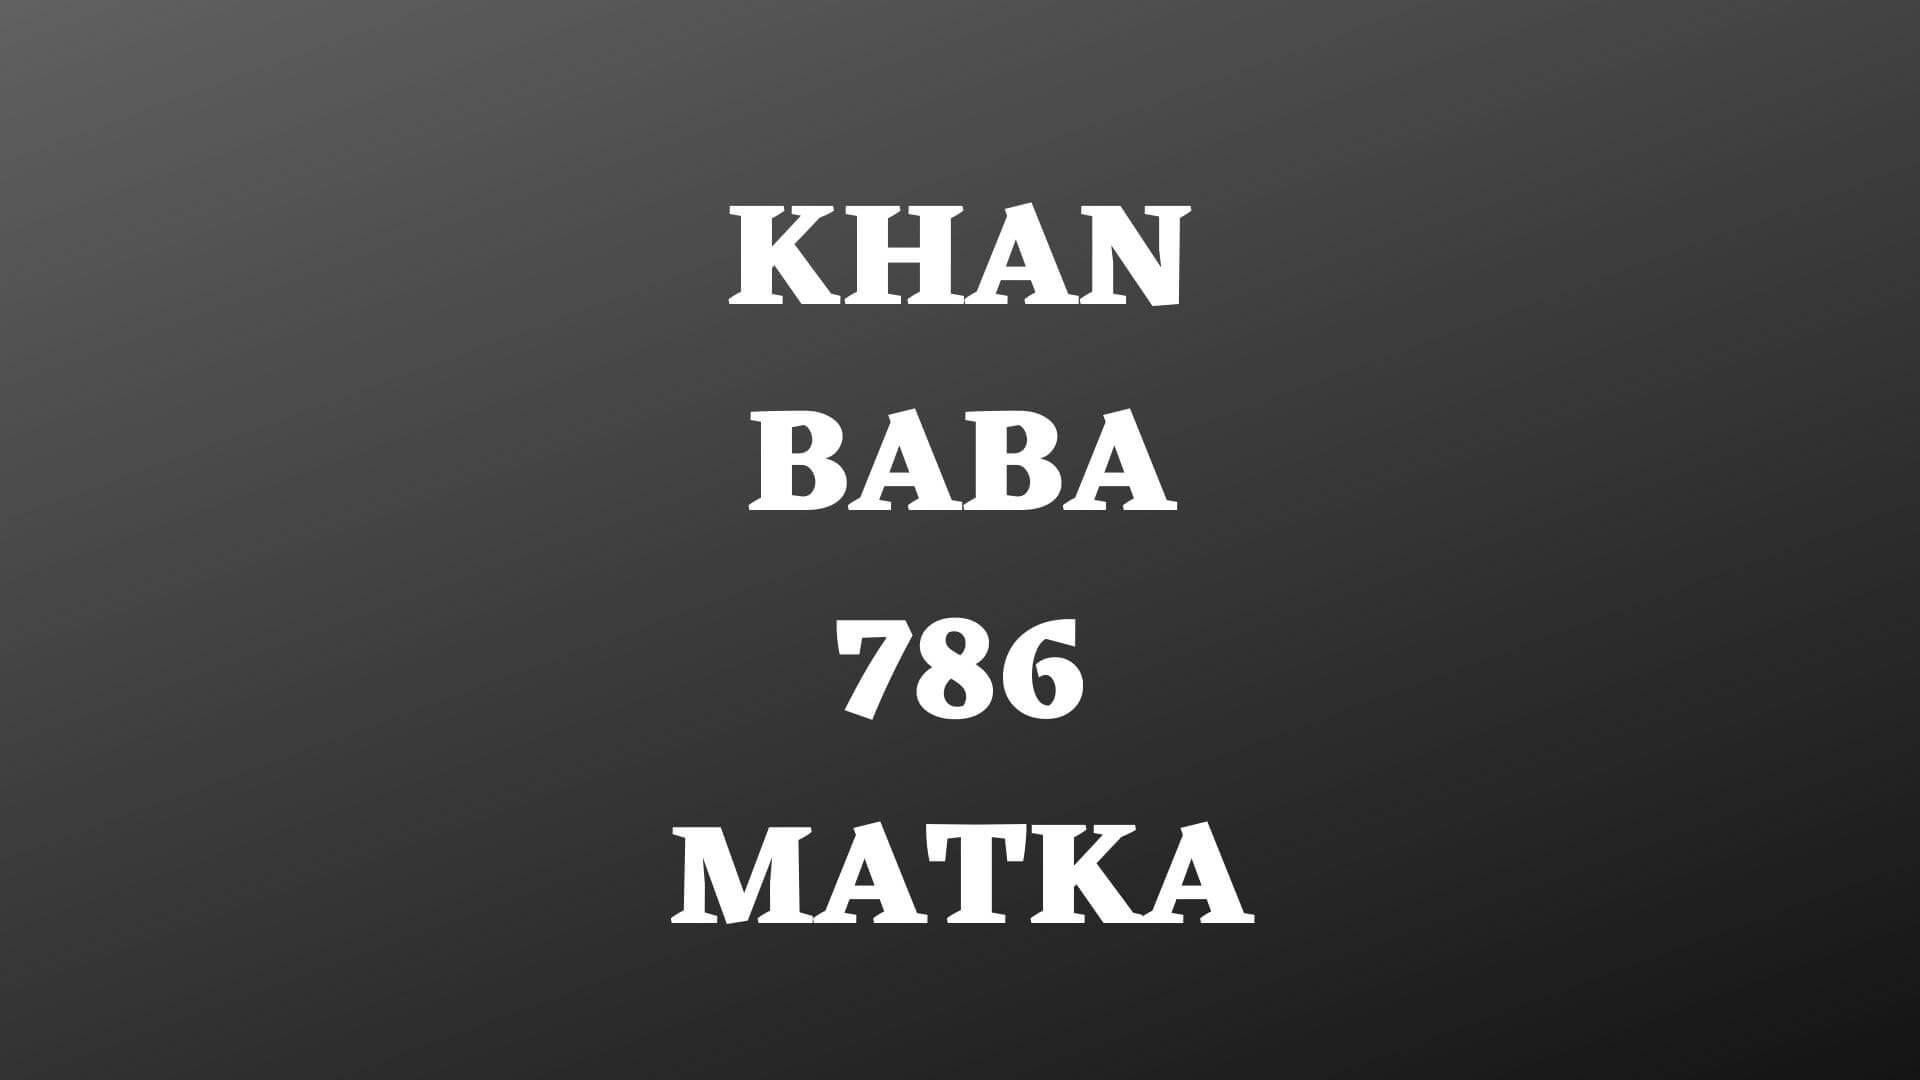 khan-baba-786-matka